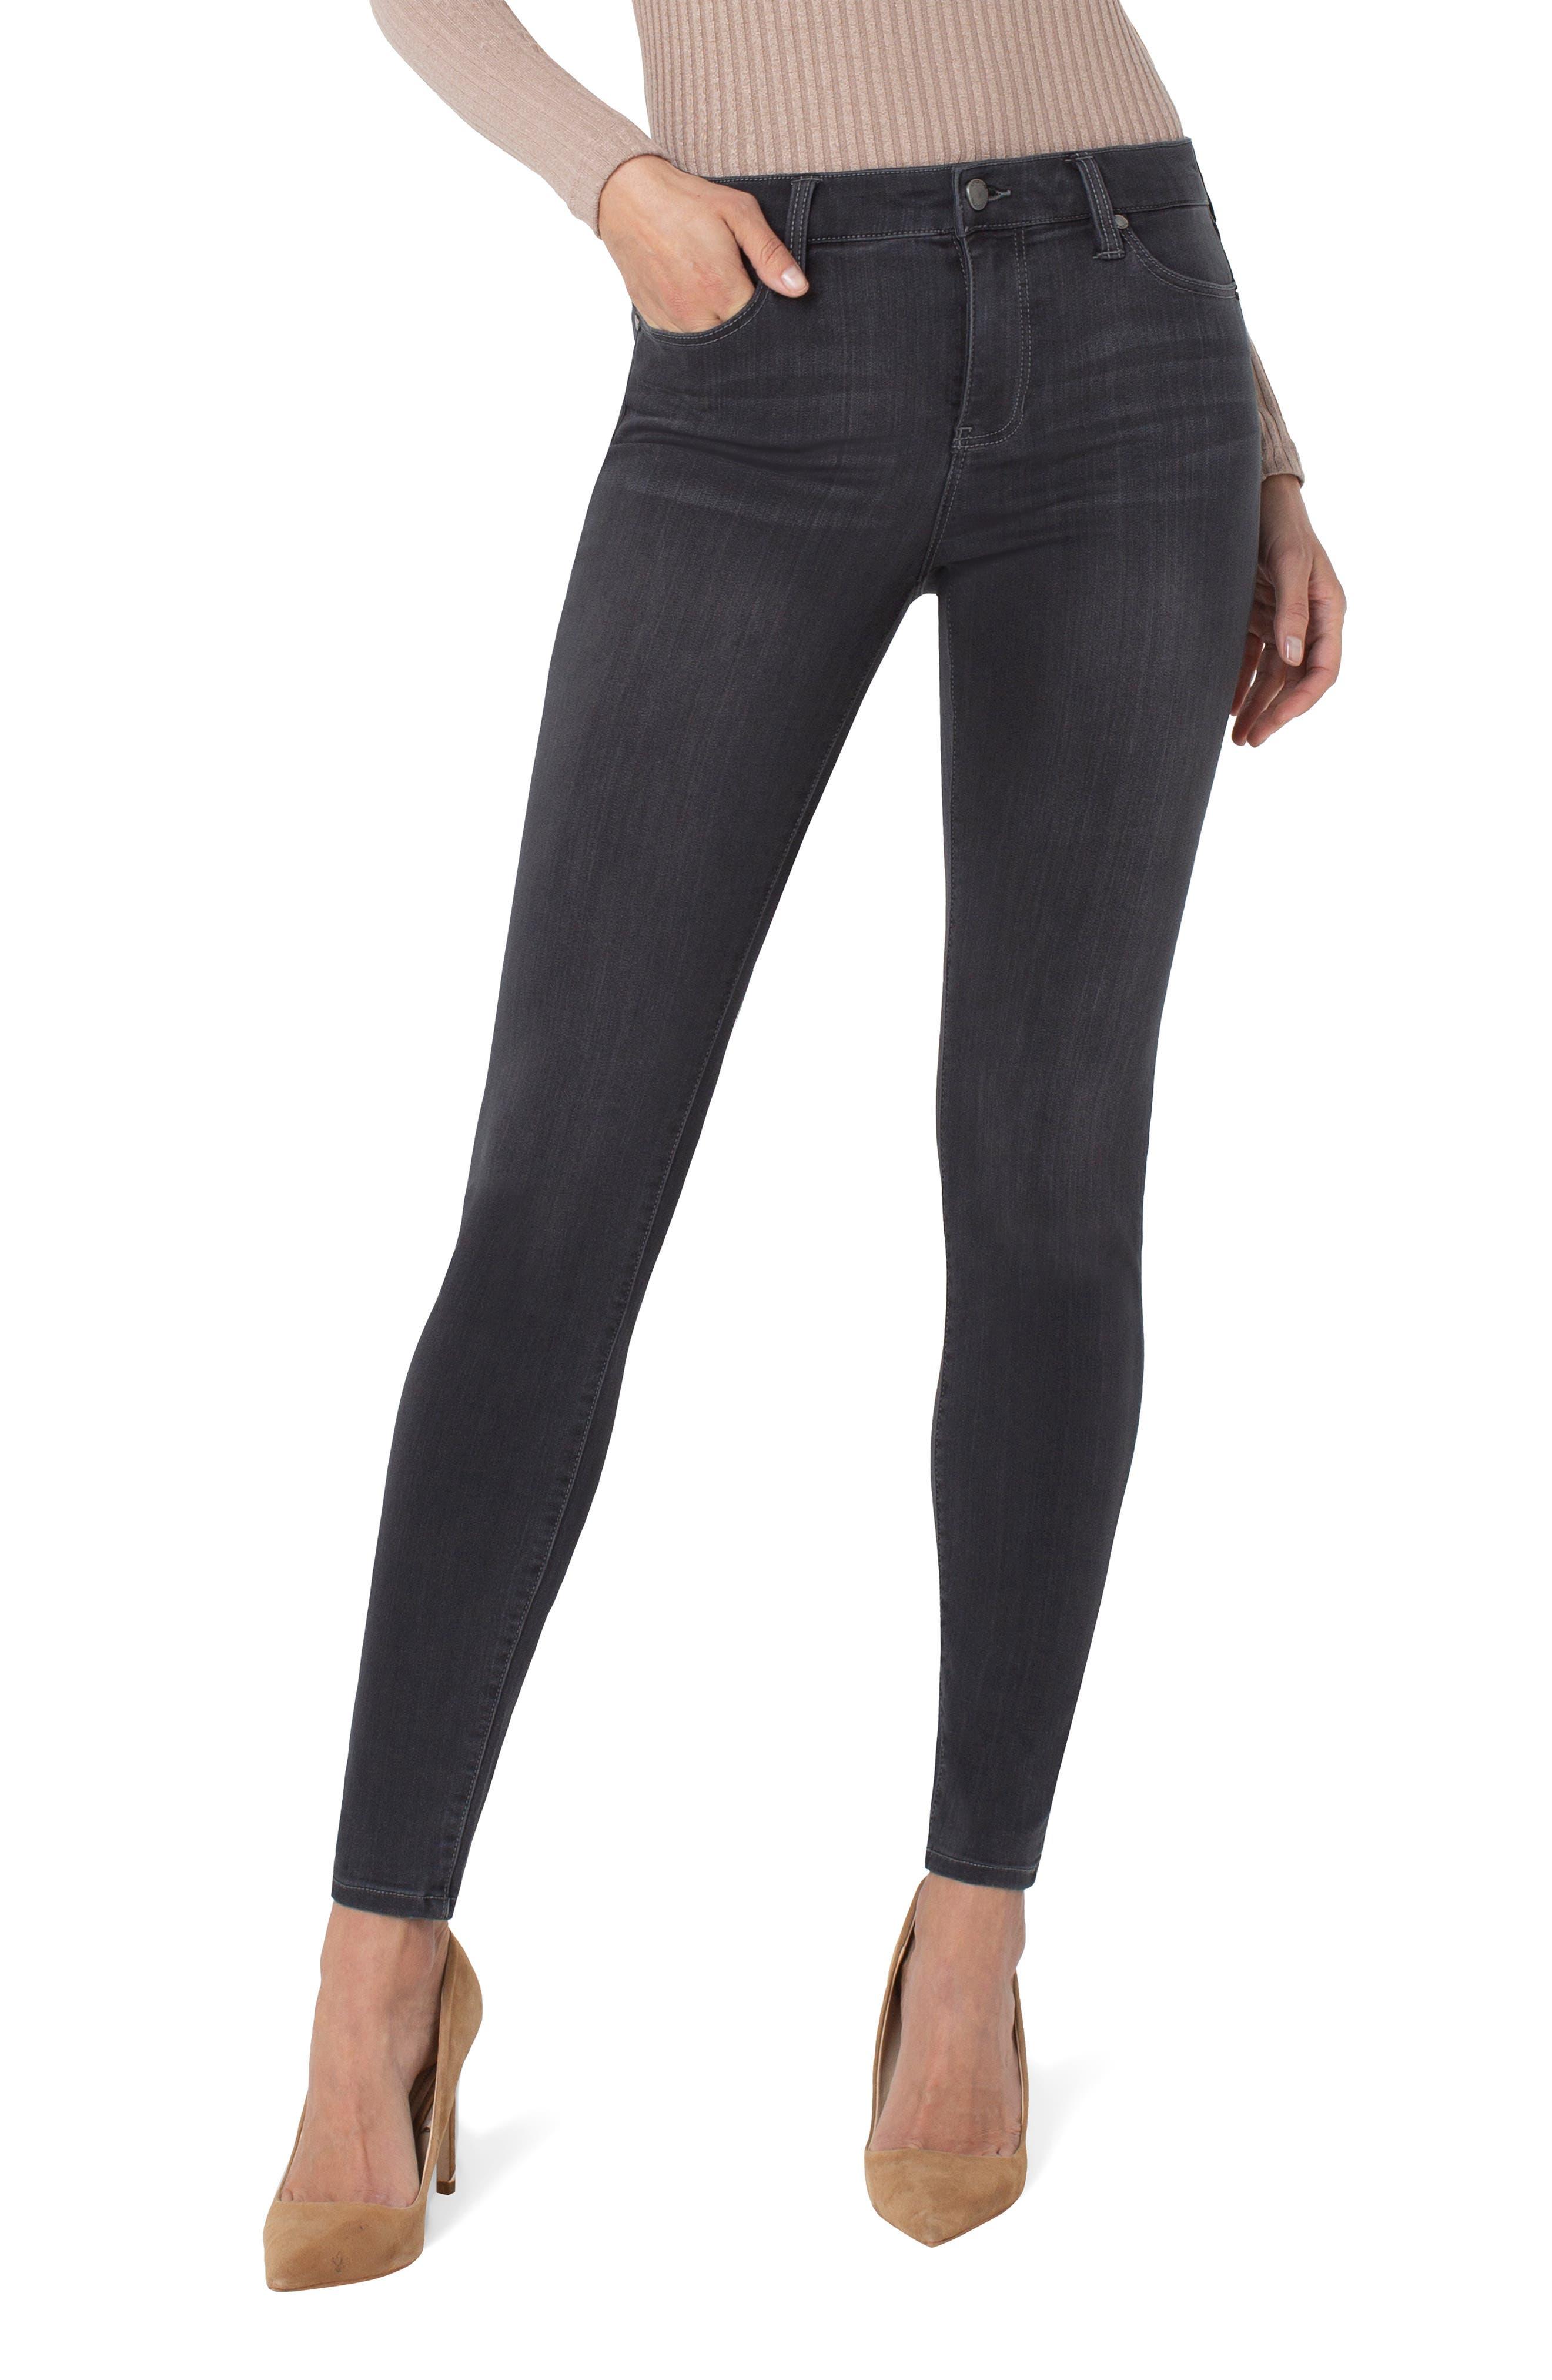 Jeans Company Abby Stretch Skinny Jeans